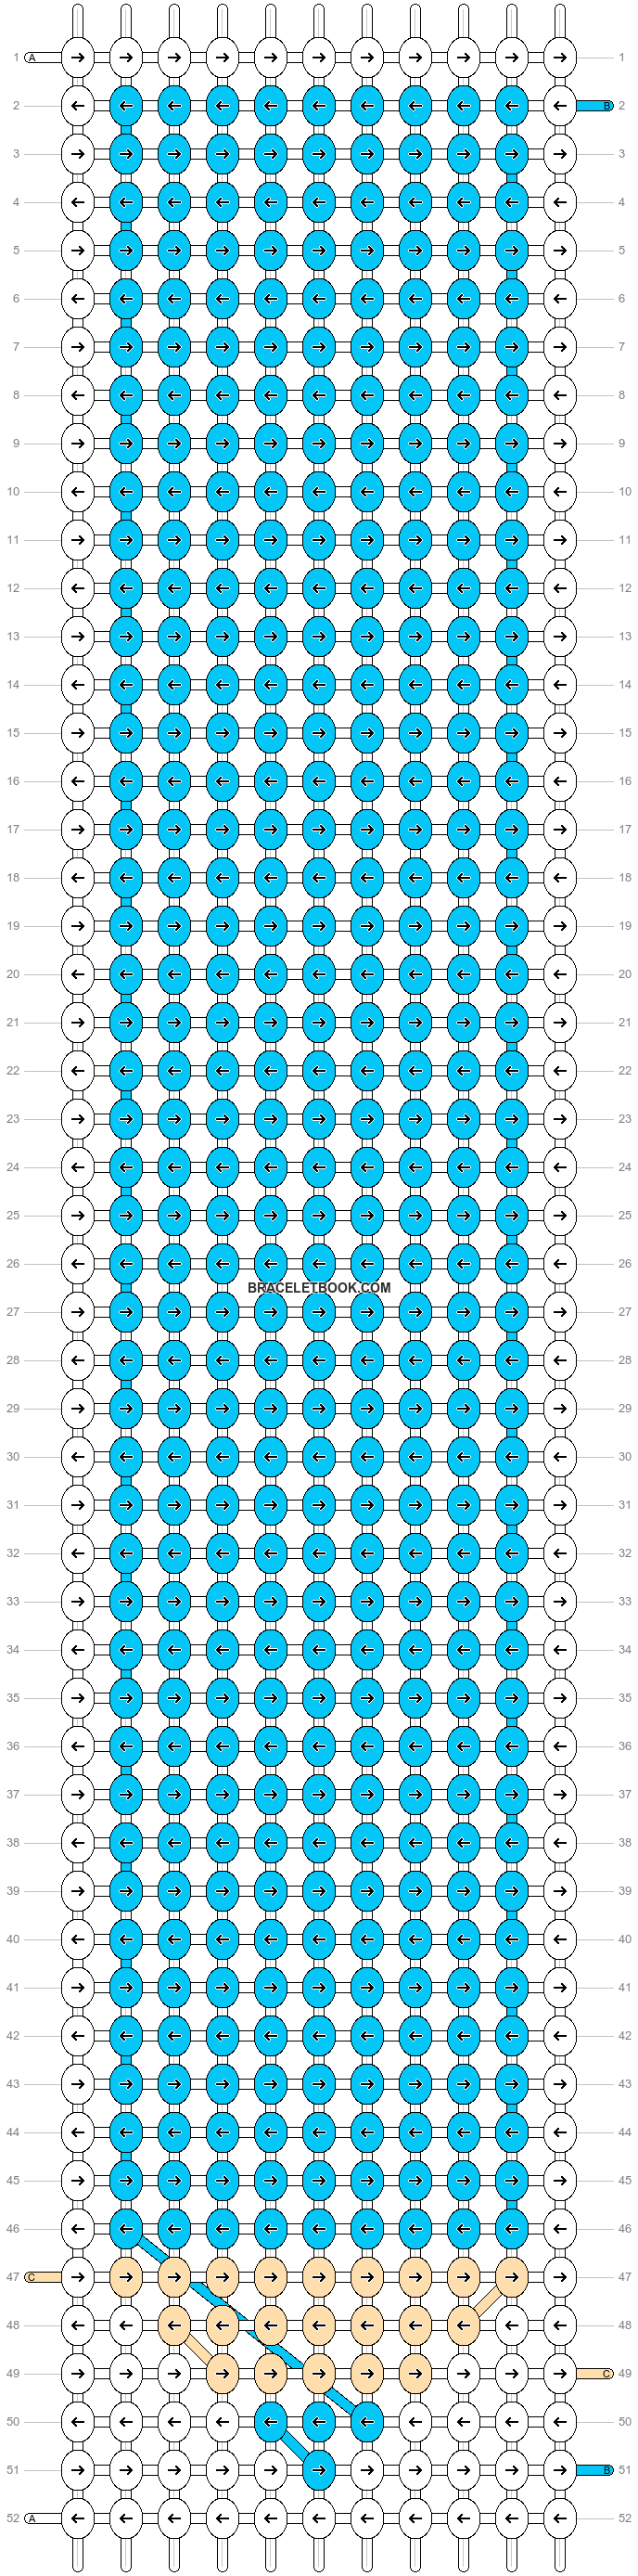 Alpha pattern #15410 pattern